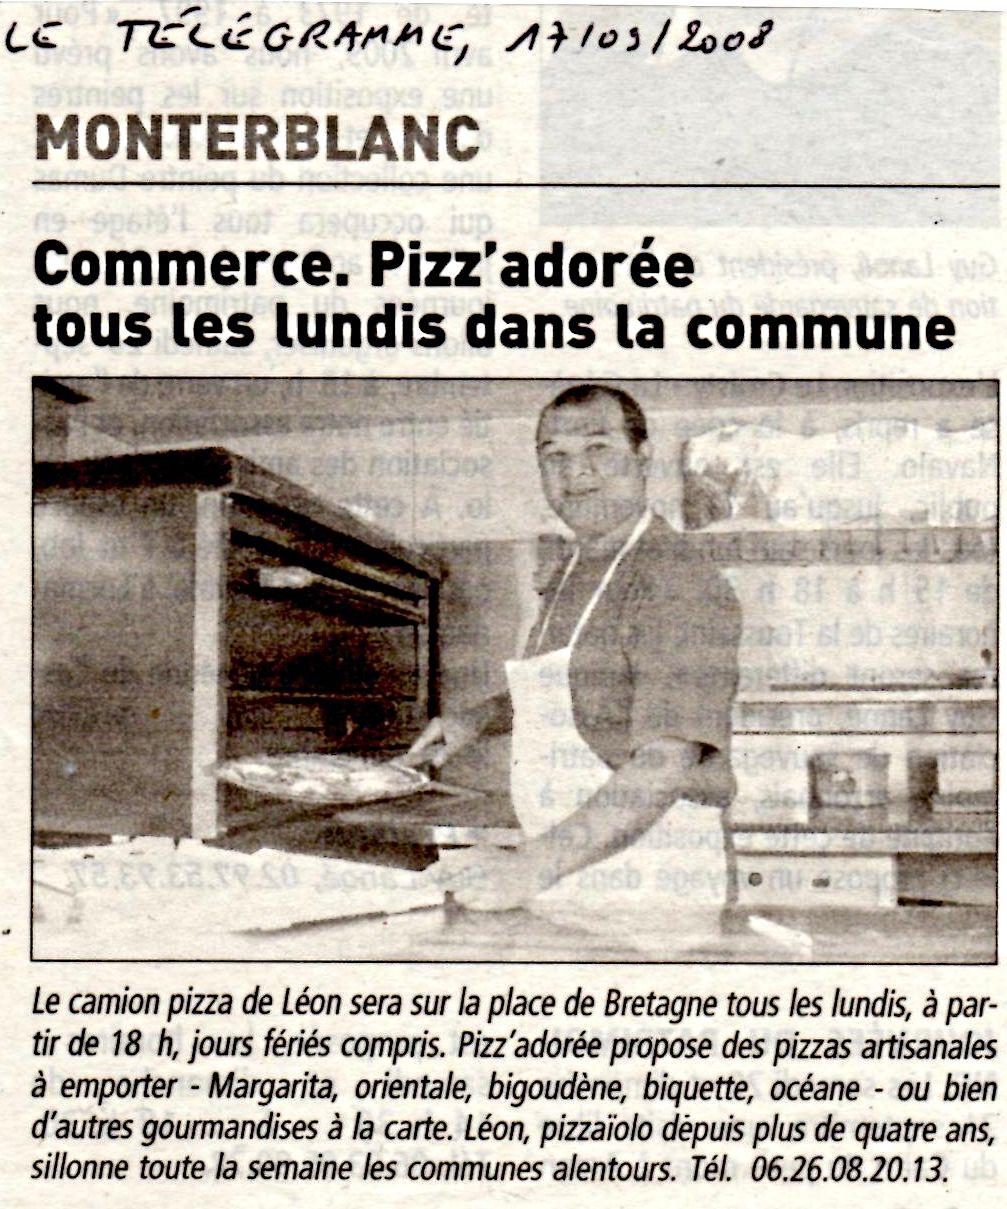 Le 17/09/08 – Monterblanc